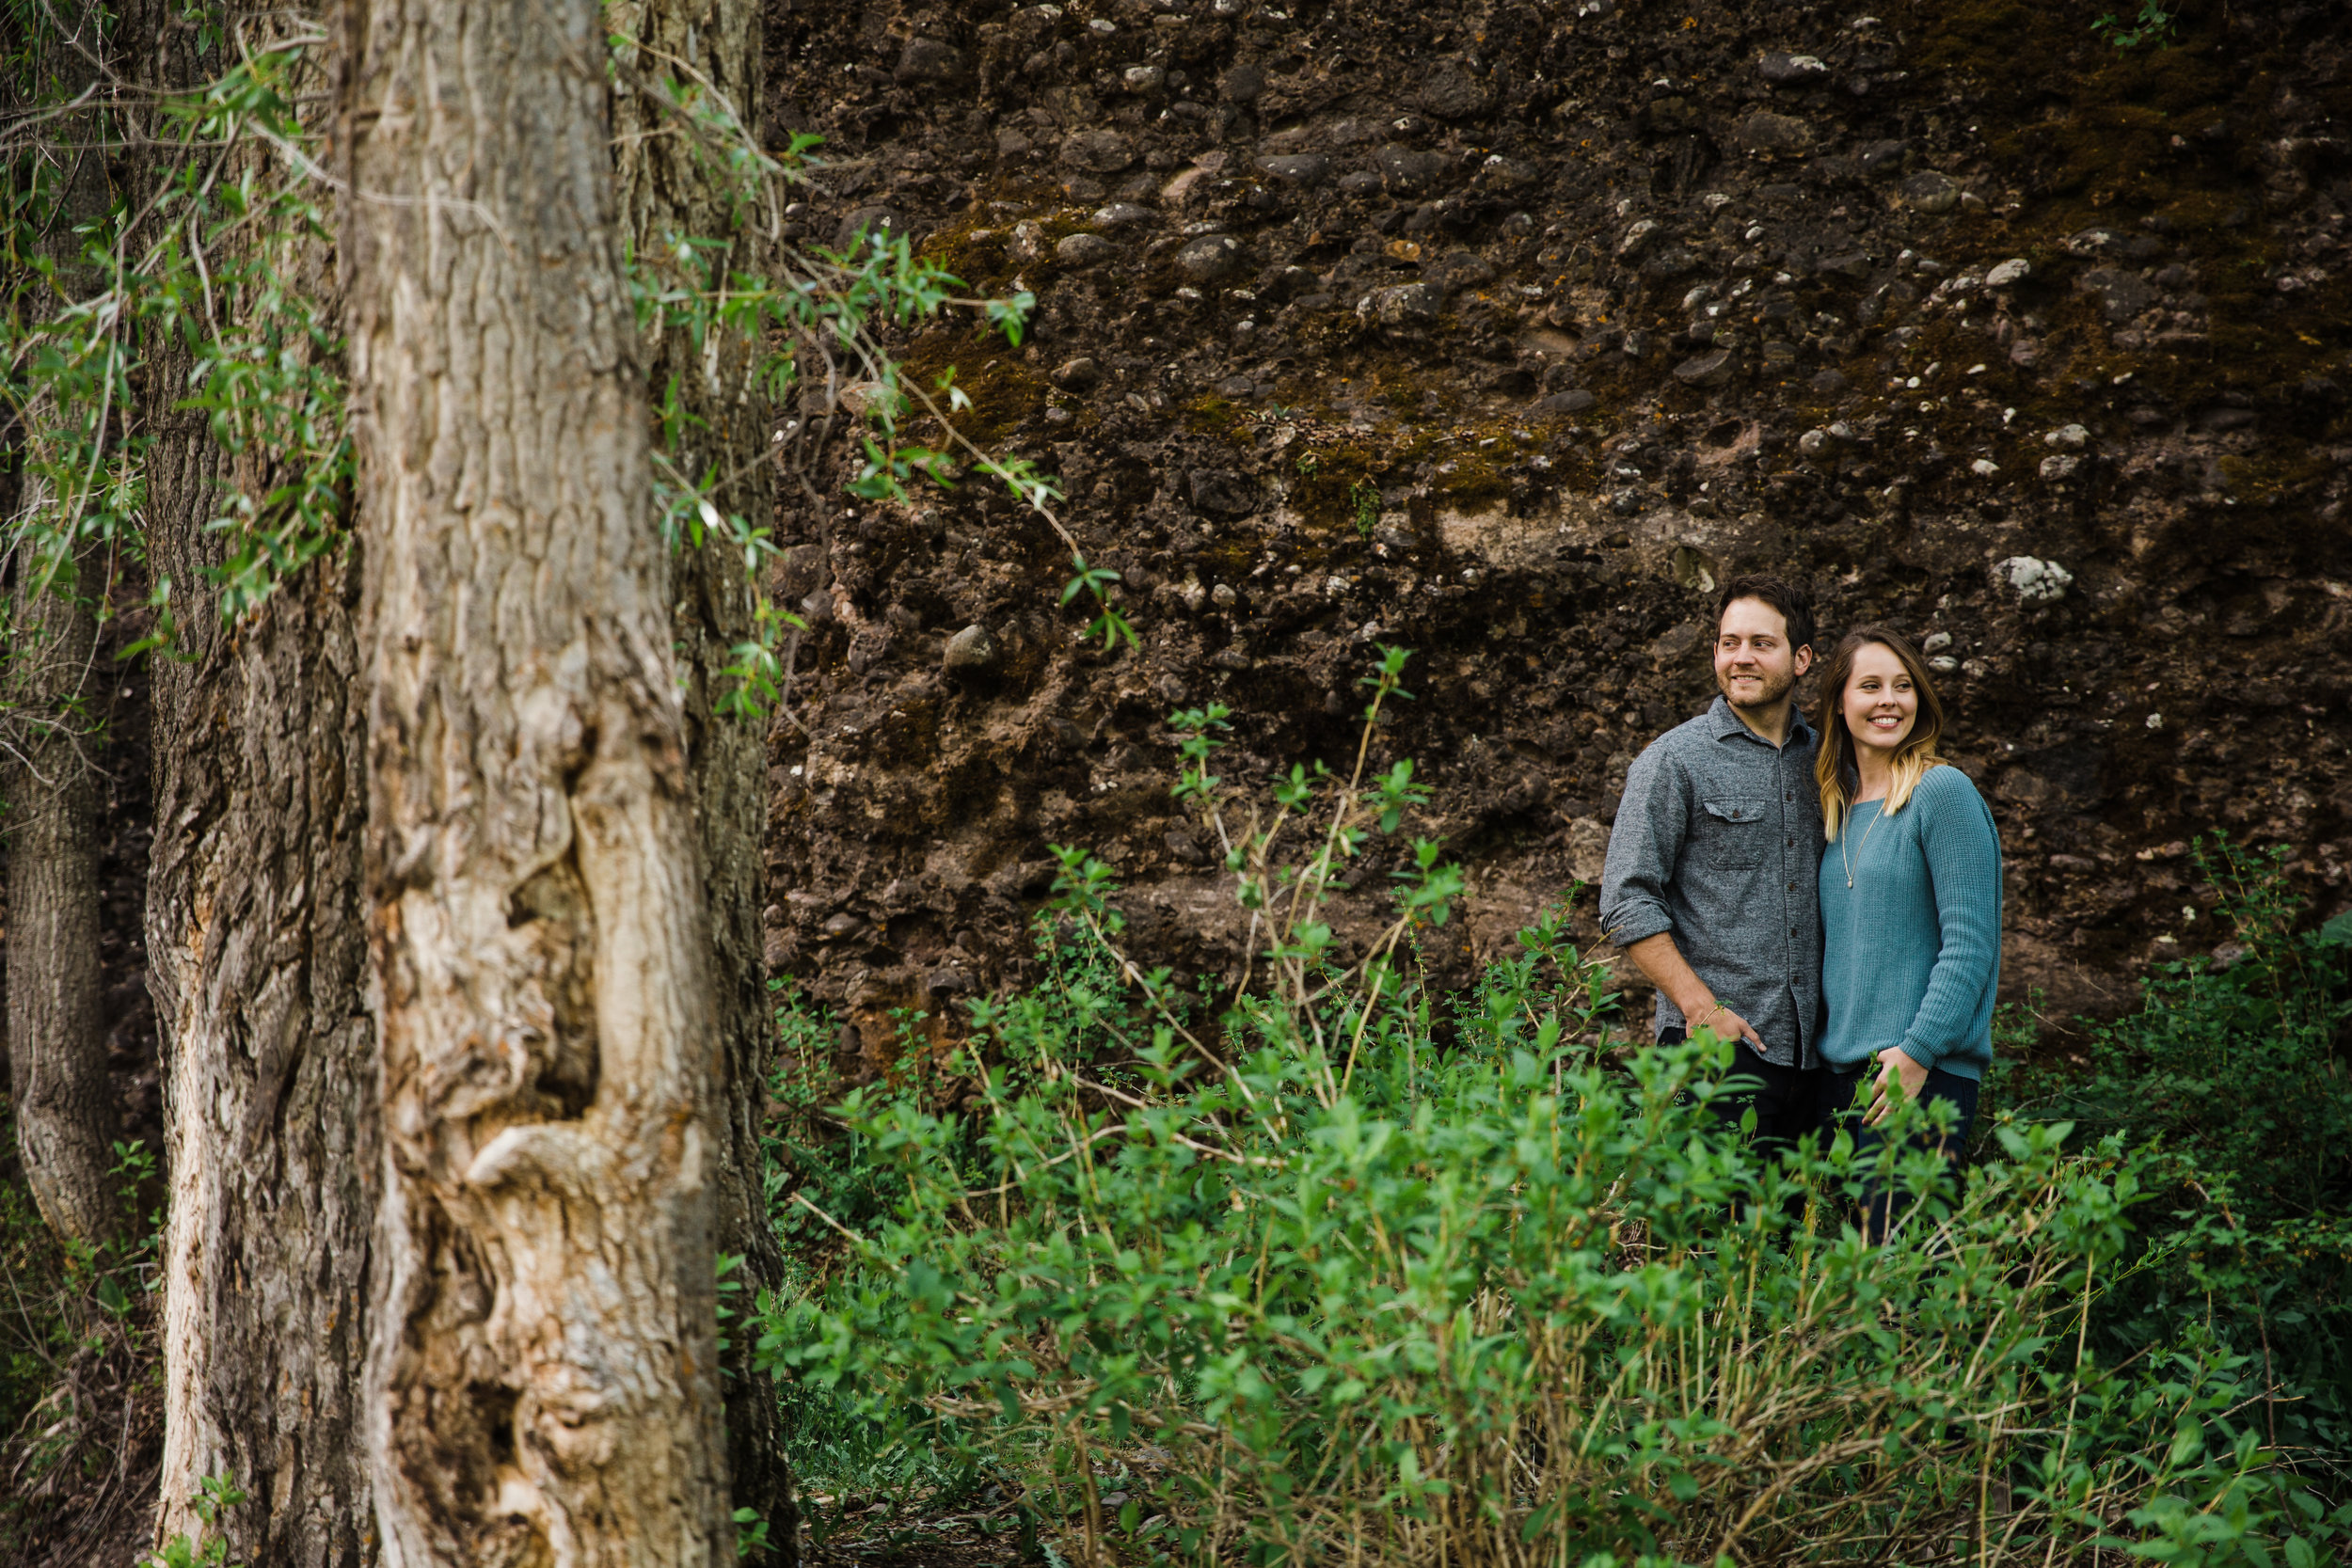 JB-Telluride-Engagement-Photography-Leahandashton-6.jpg